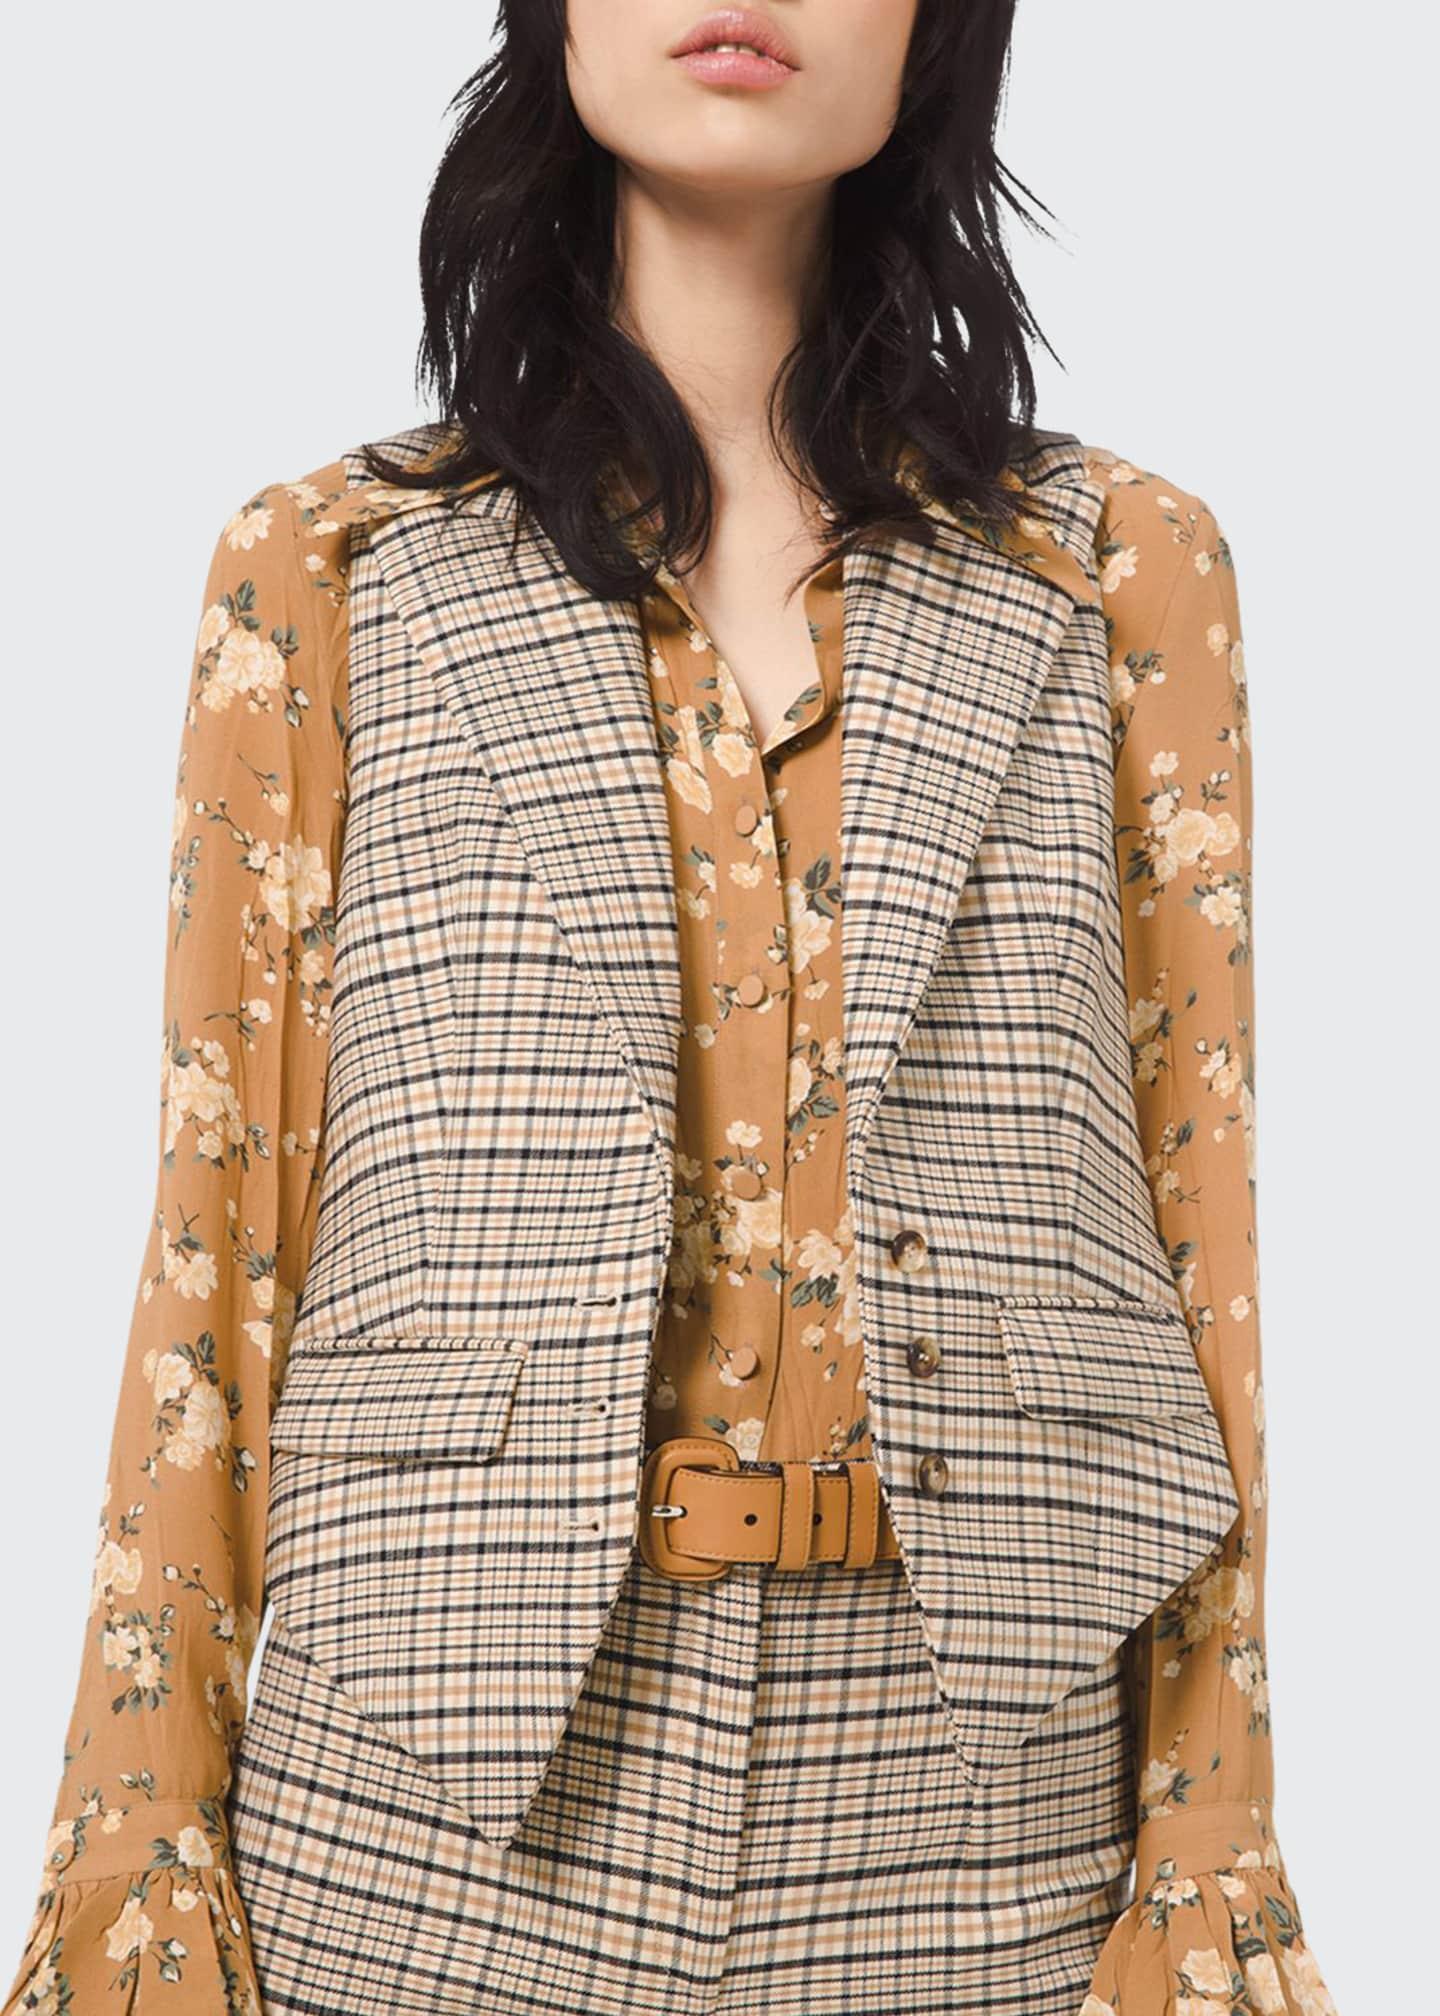 Michael Kors Collection Plaid Stretch Wool Vest